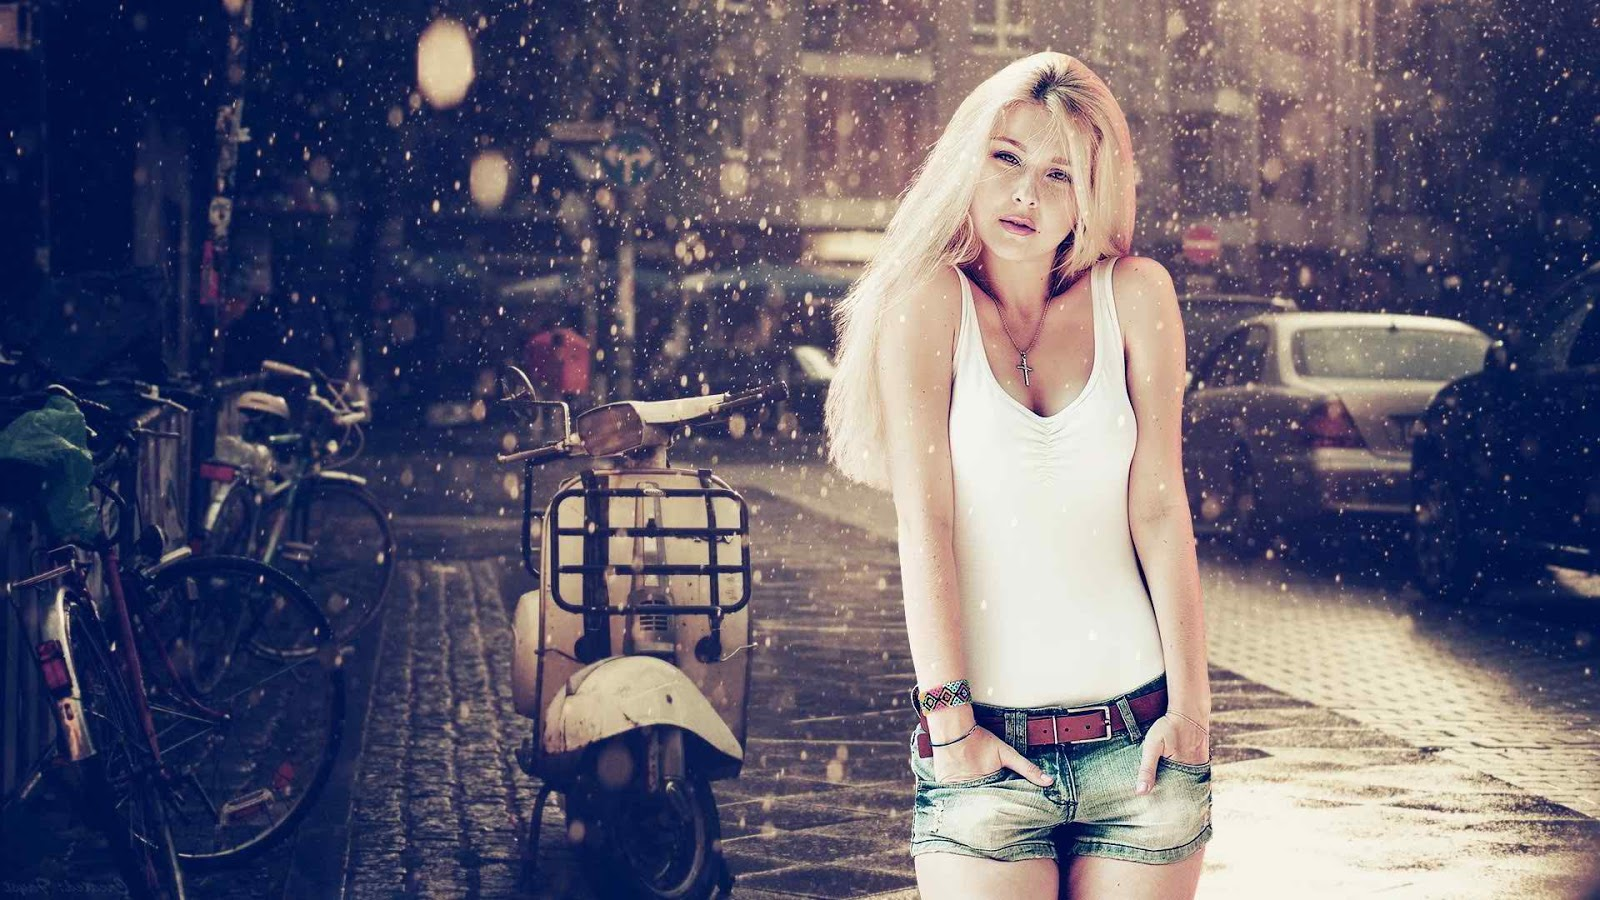 white girl dancing on rain whatsapp profile pictures